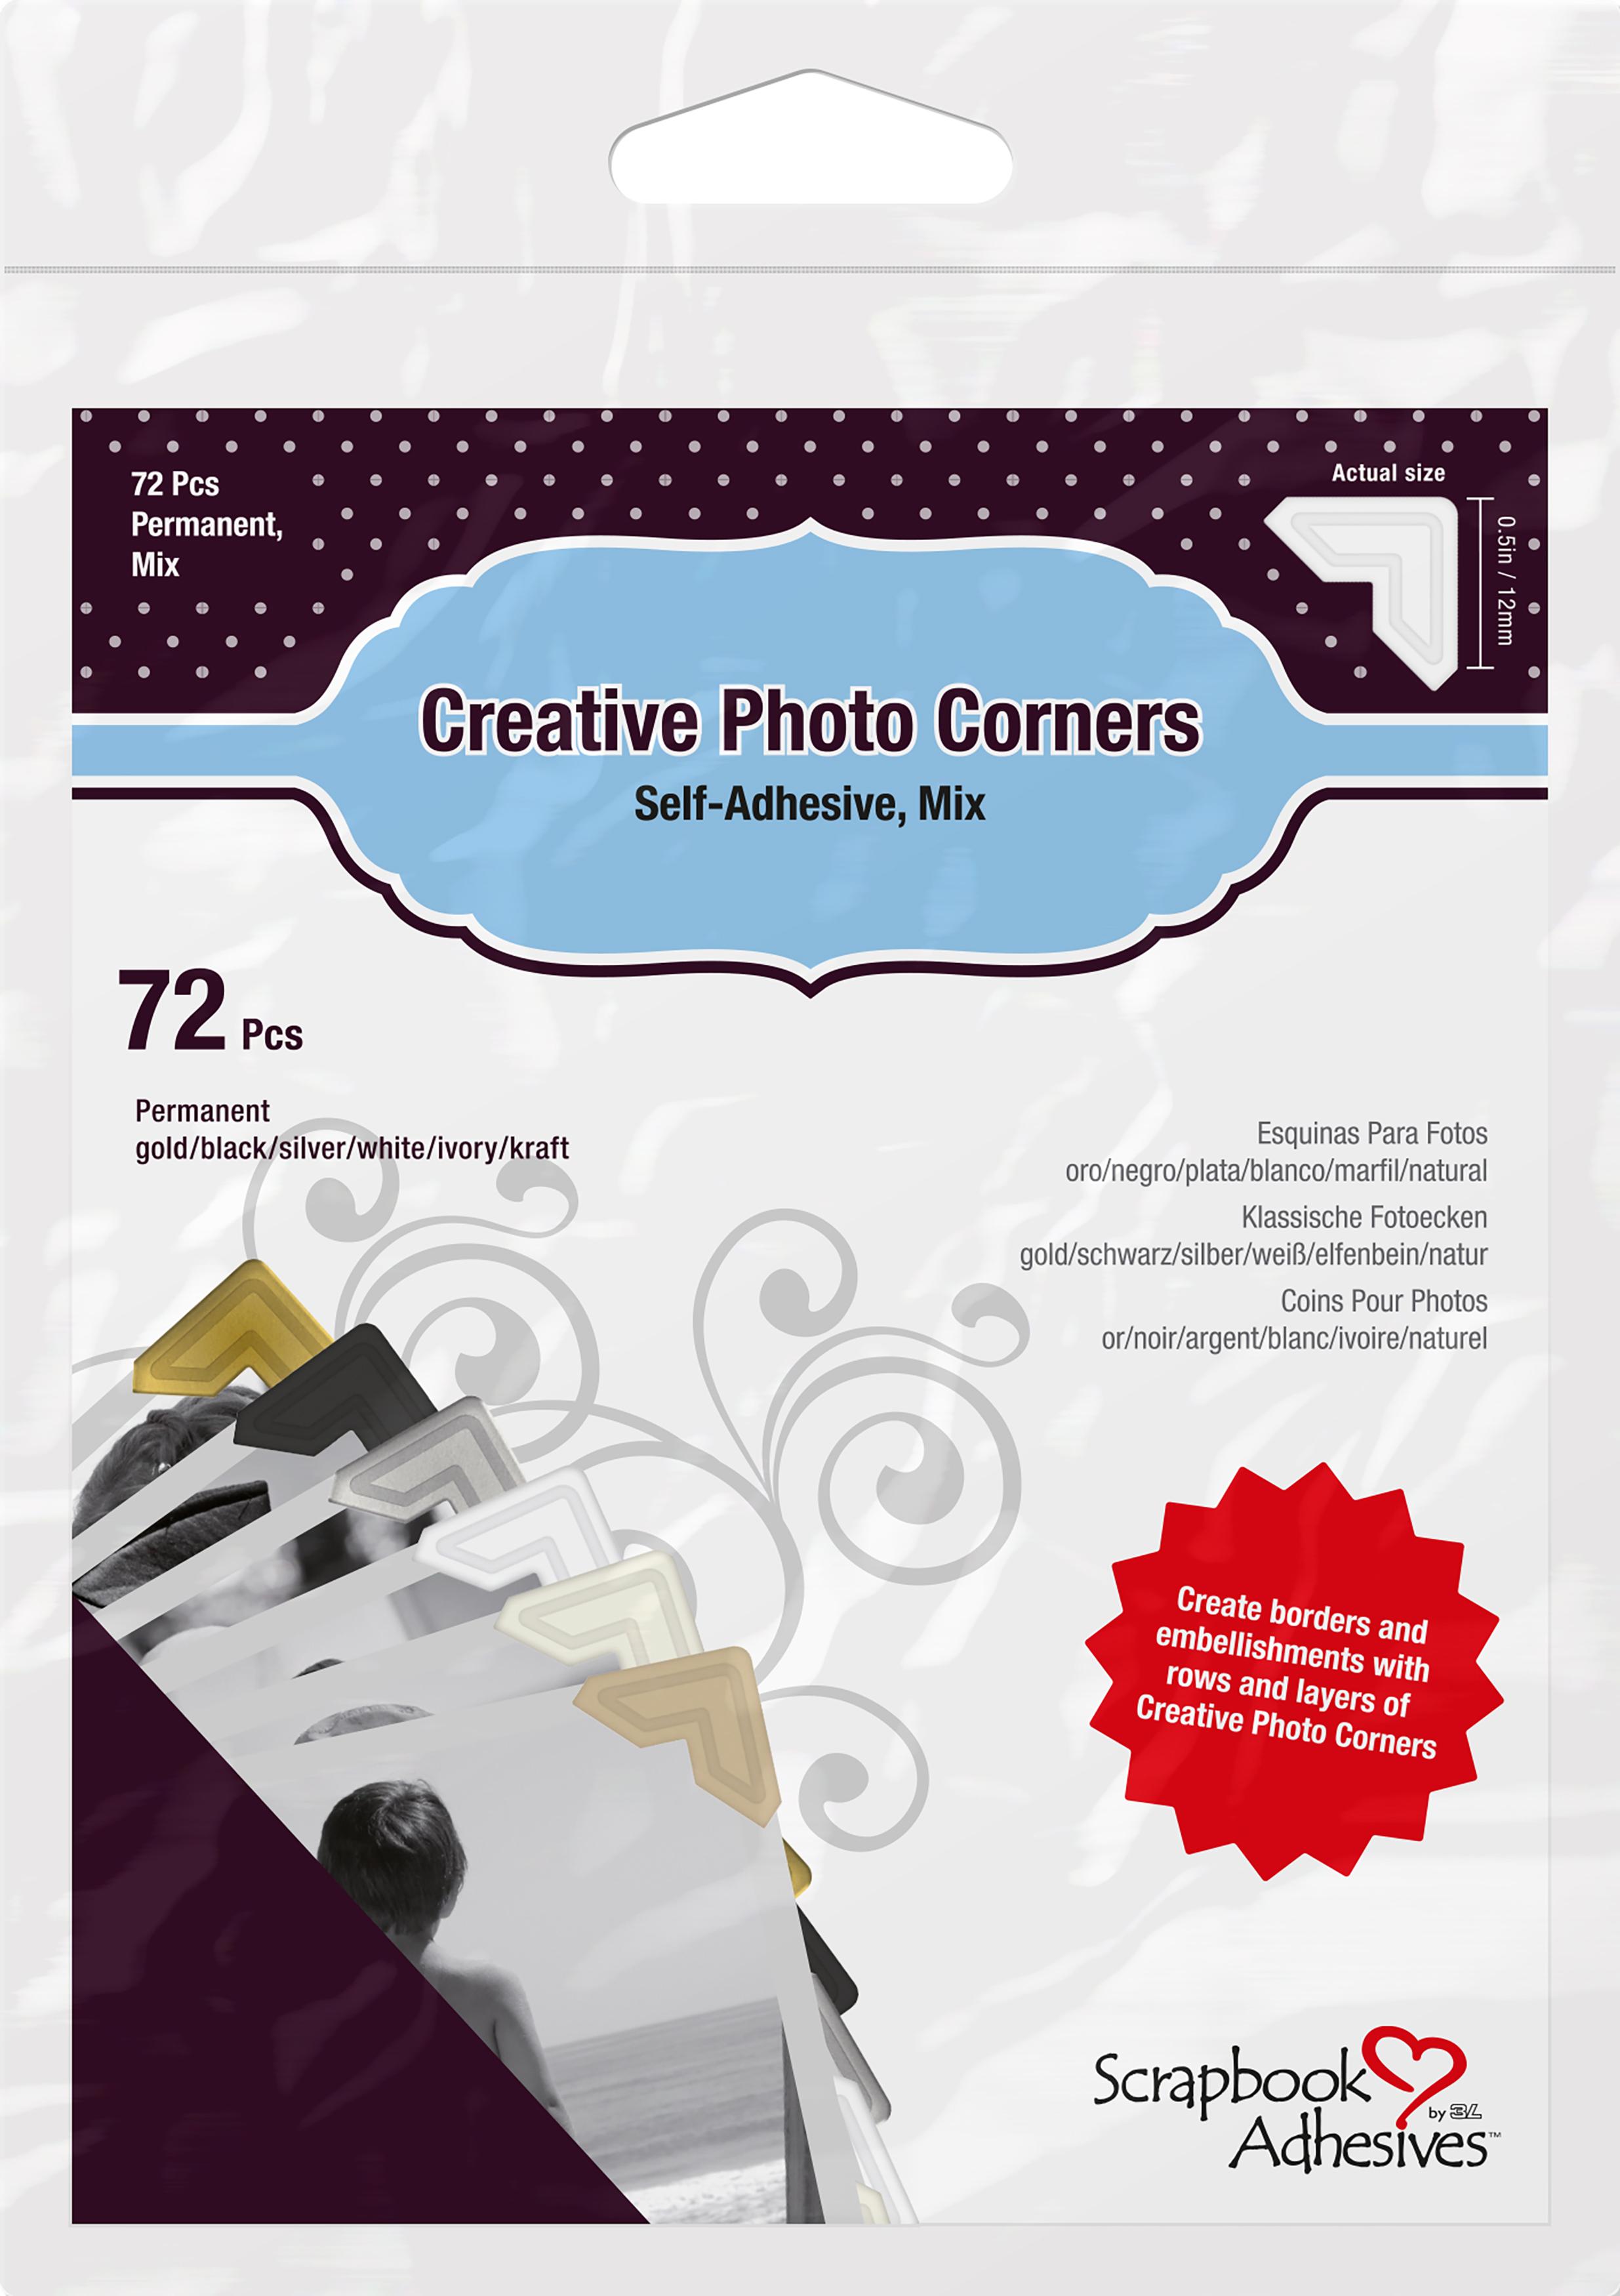 Scrapbook Adhesives Coins pour photos - 72 pi?ces ? Creative Photo Corners